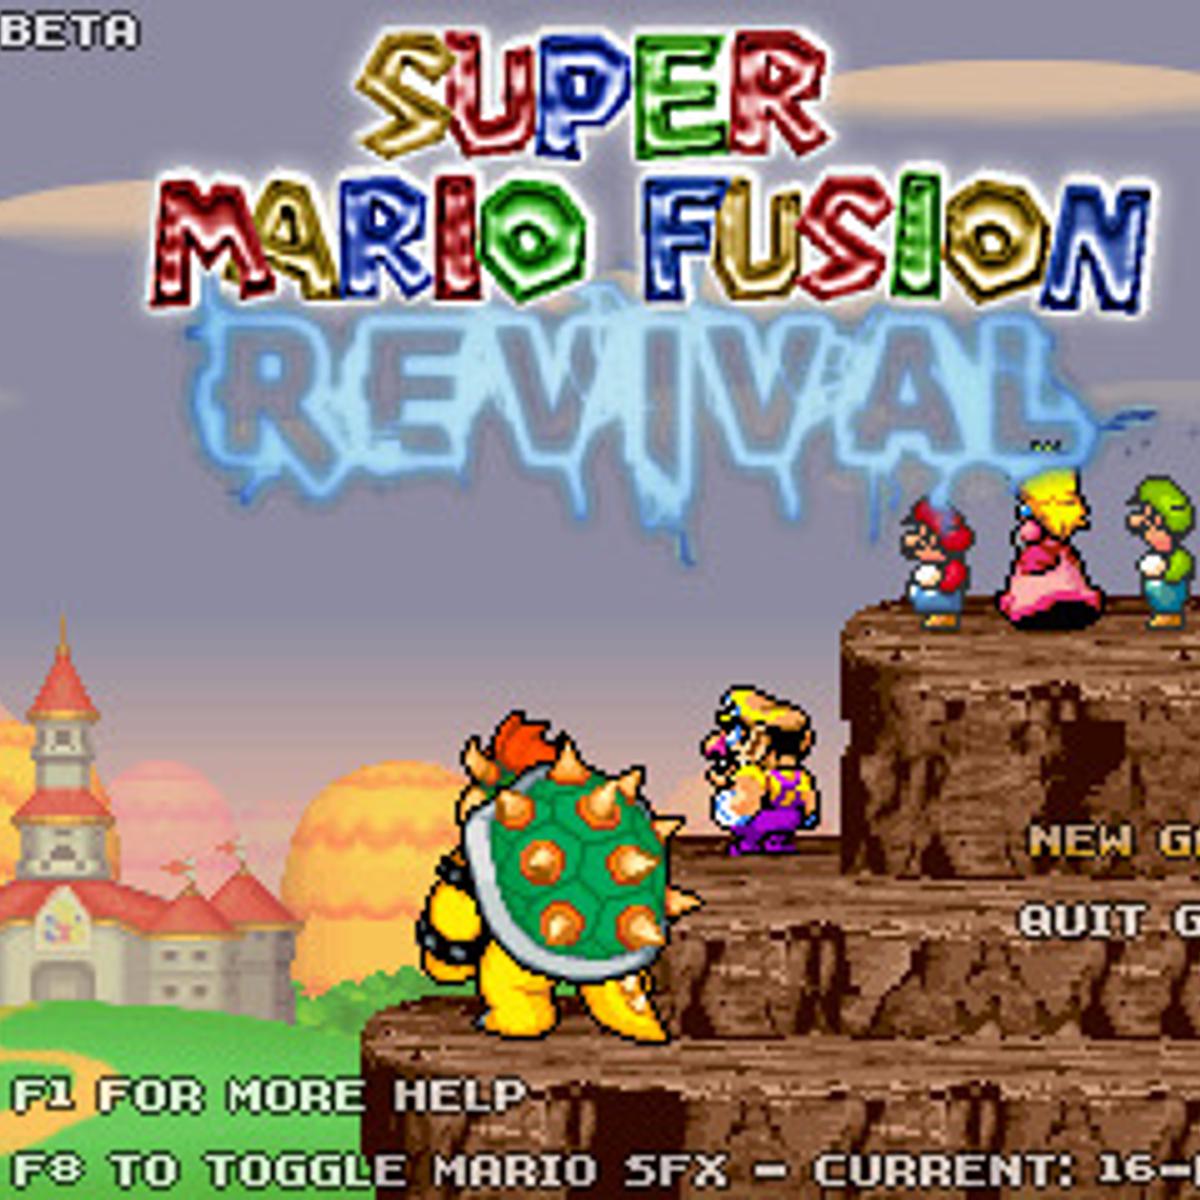 Super Mario Fusion Revival Alternatives and Similar Games